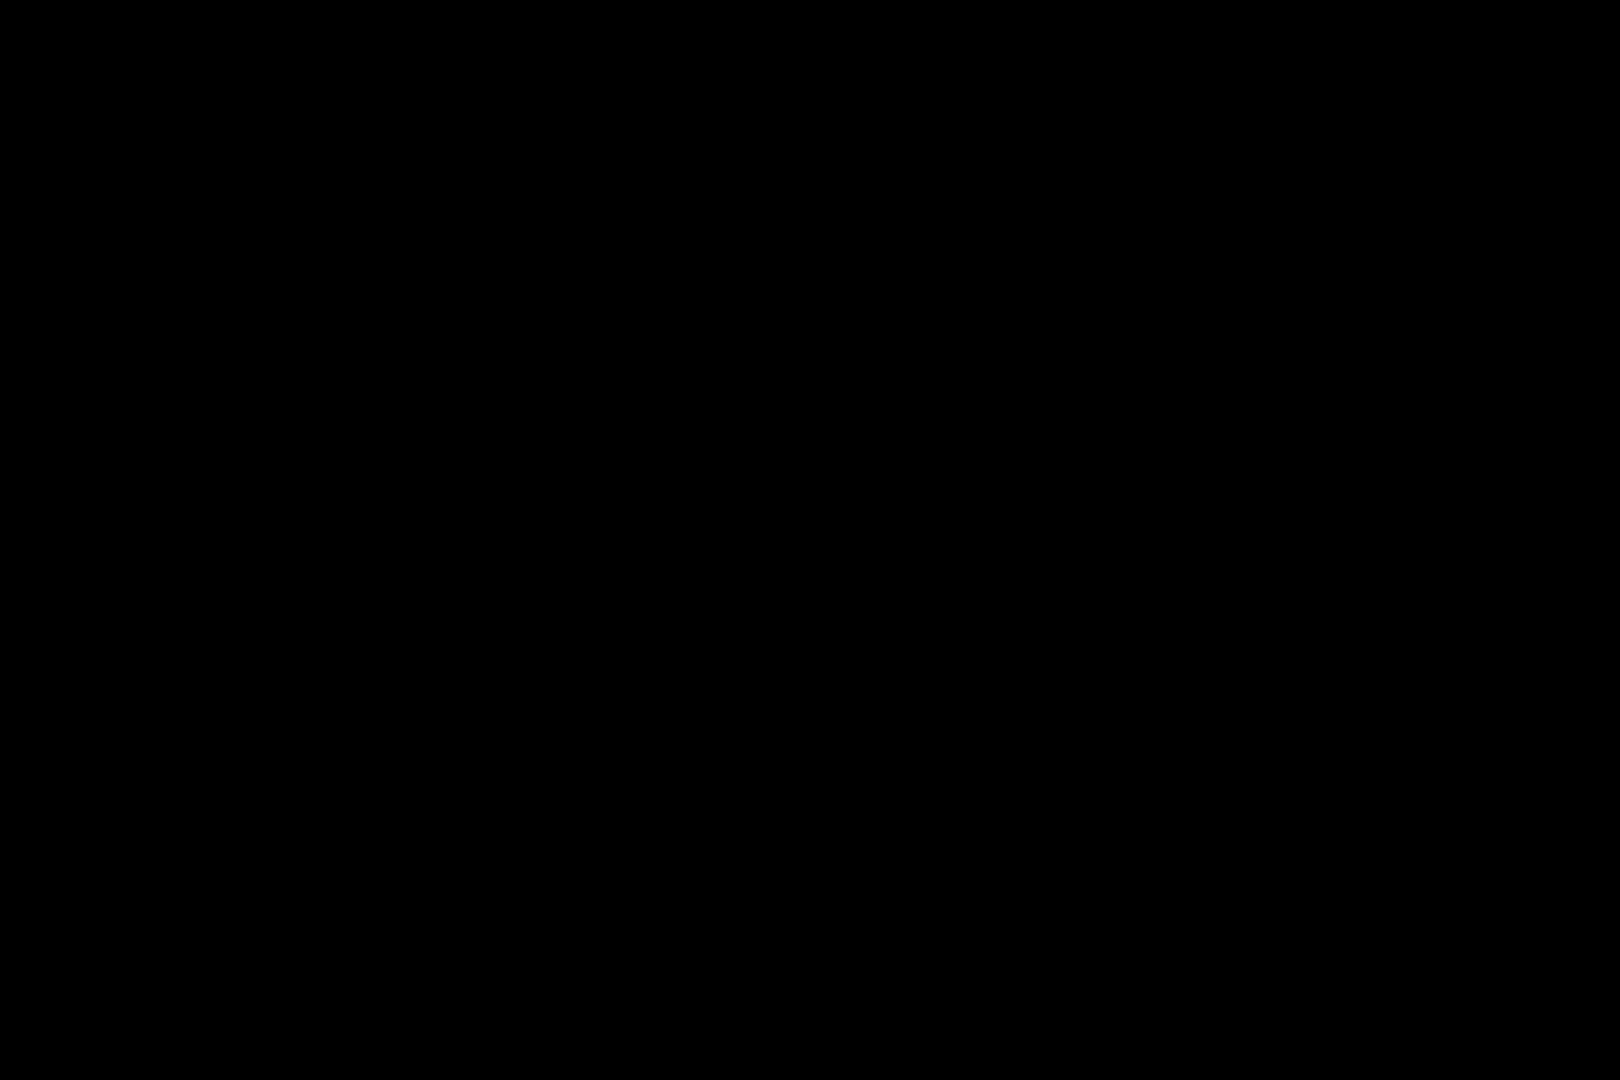 充血監督の深夜の運動会Vol.36 美女OL   0  23連発 13